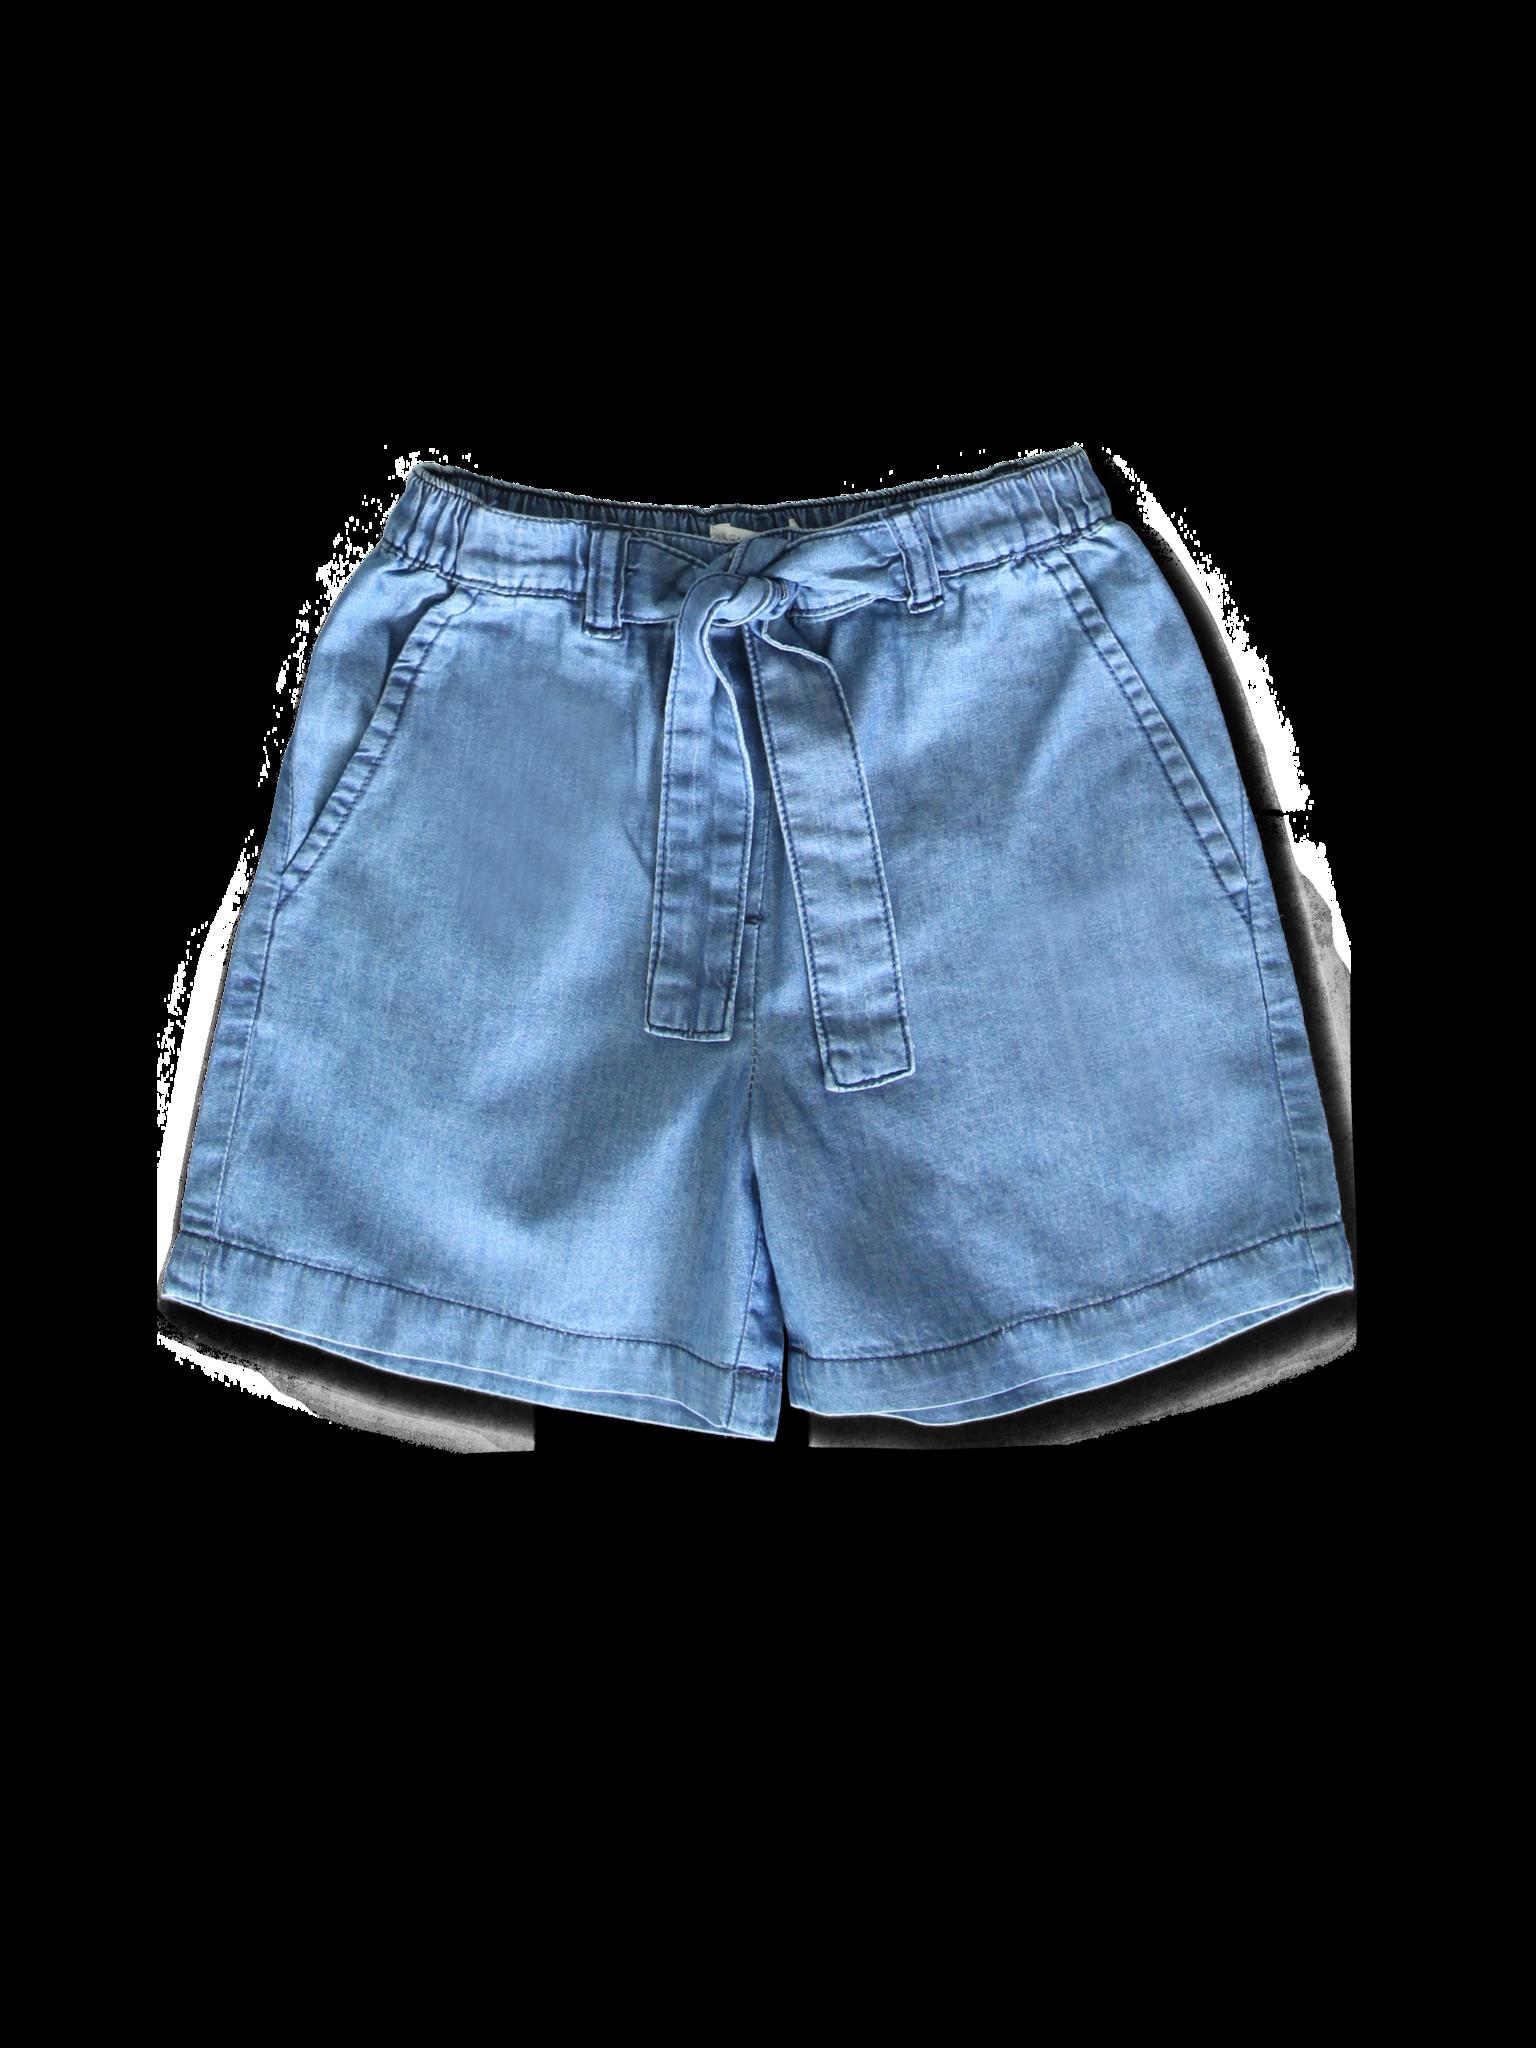 Lemon Beret | Summer 2020 Small Girls | Shorts | 10 pcs/box